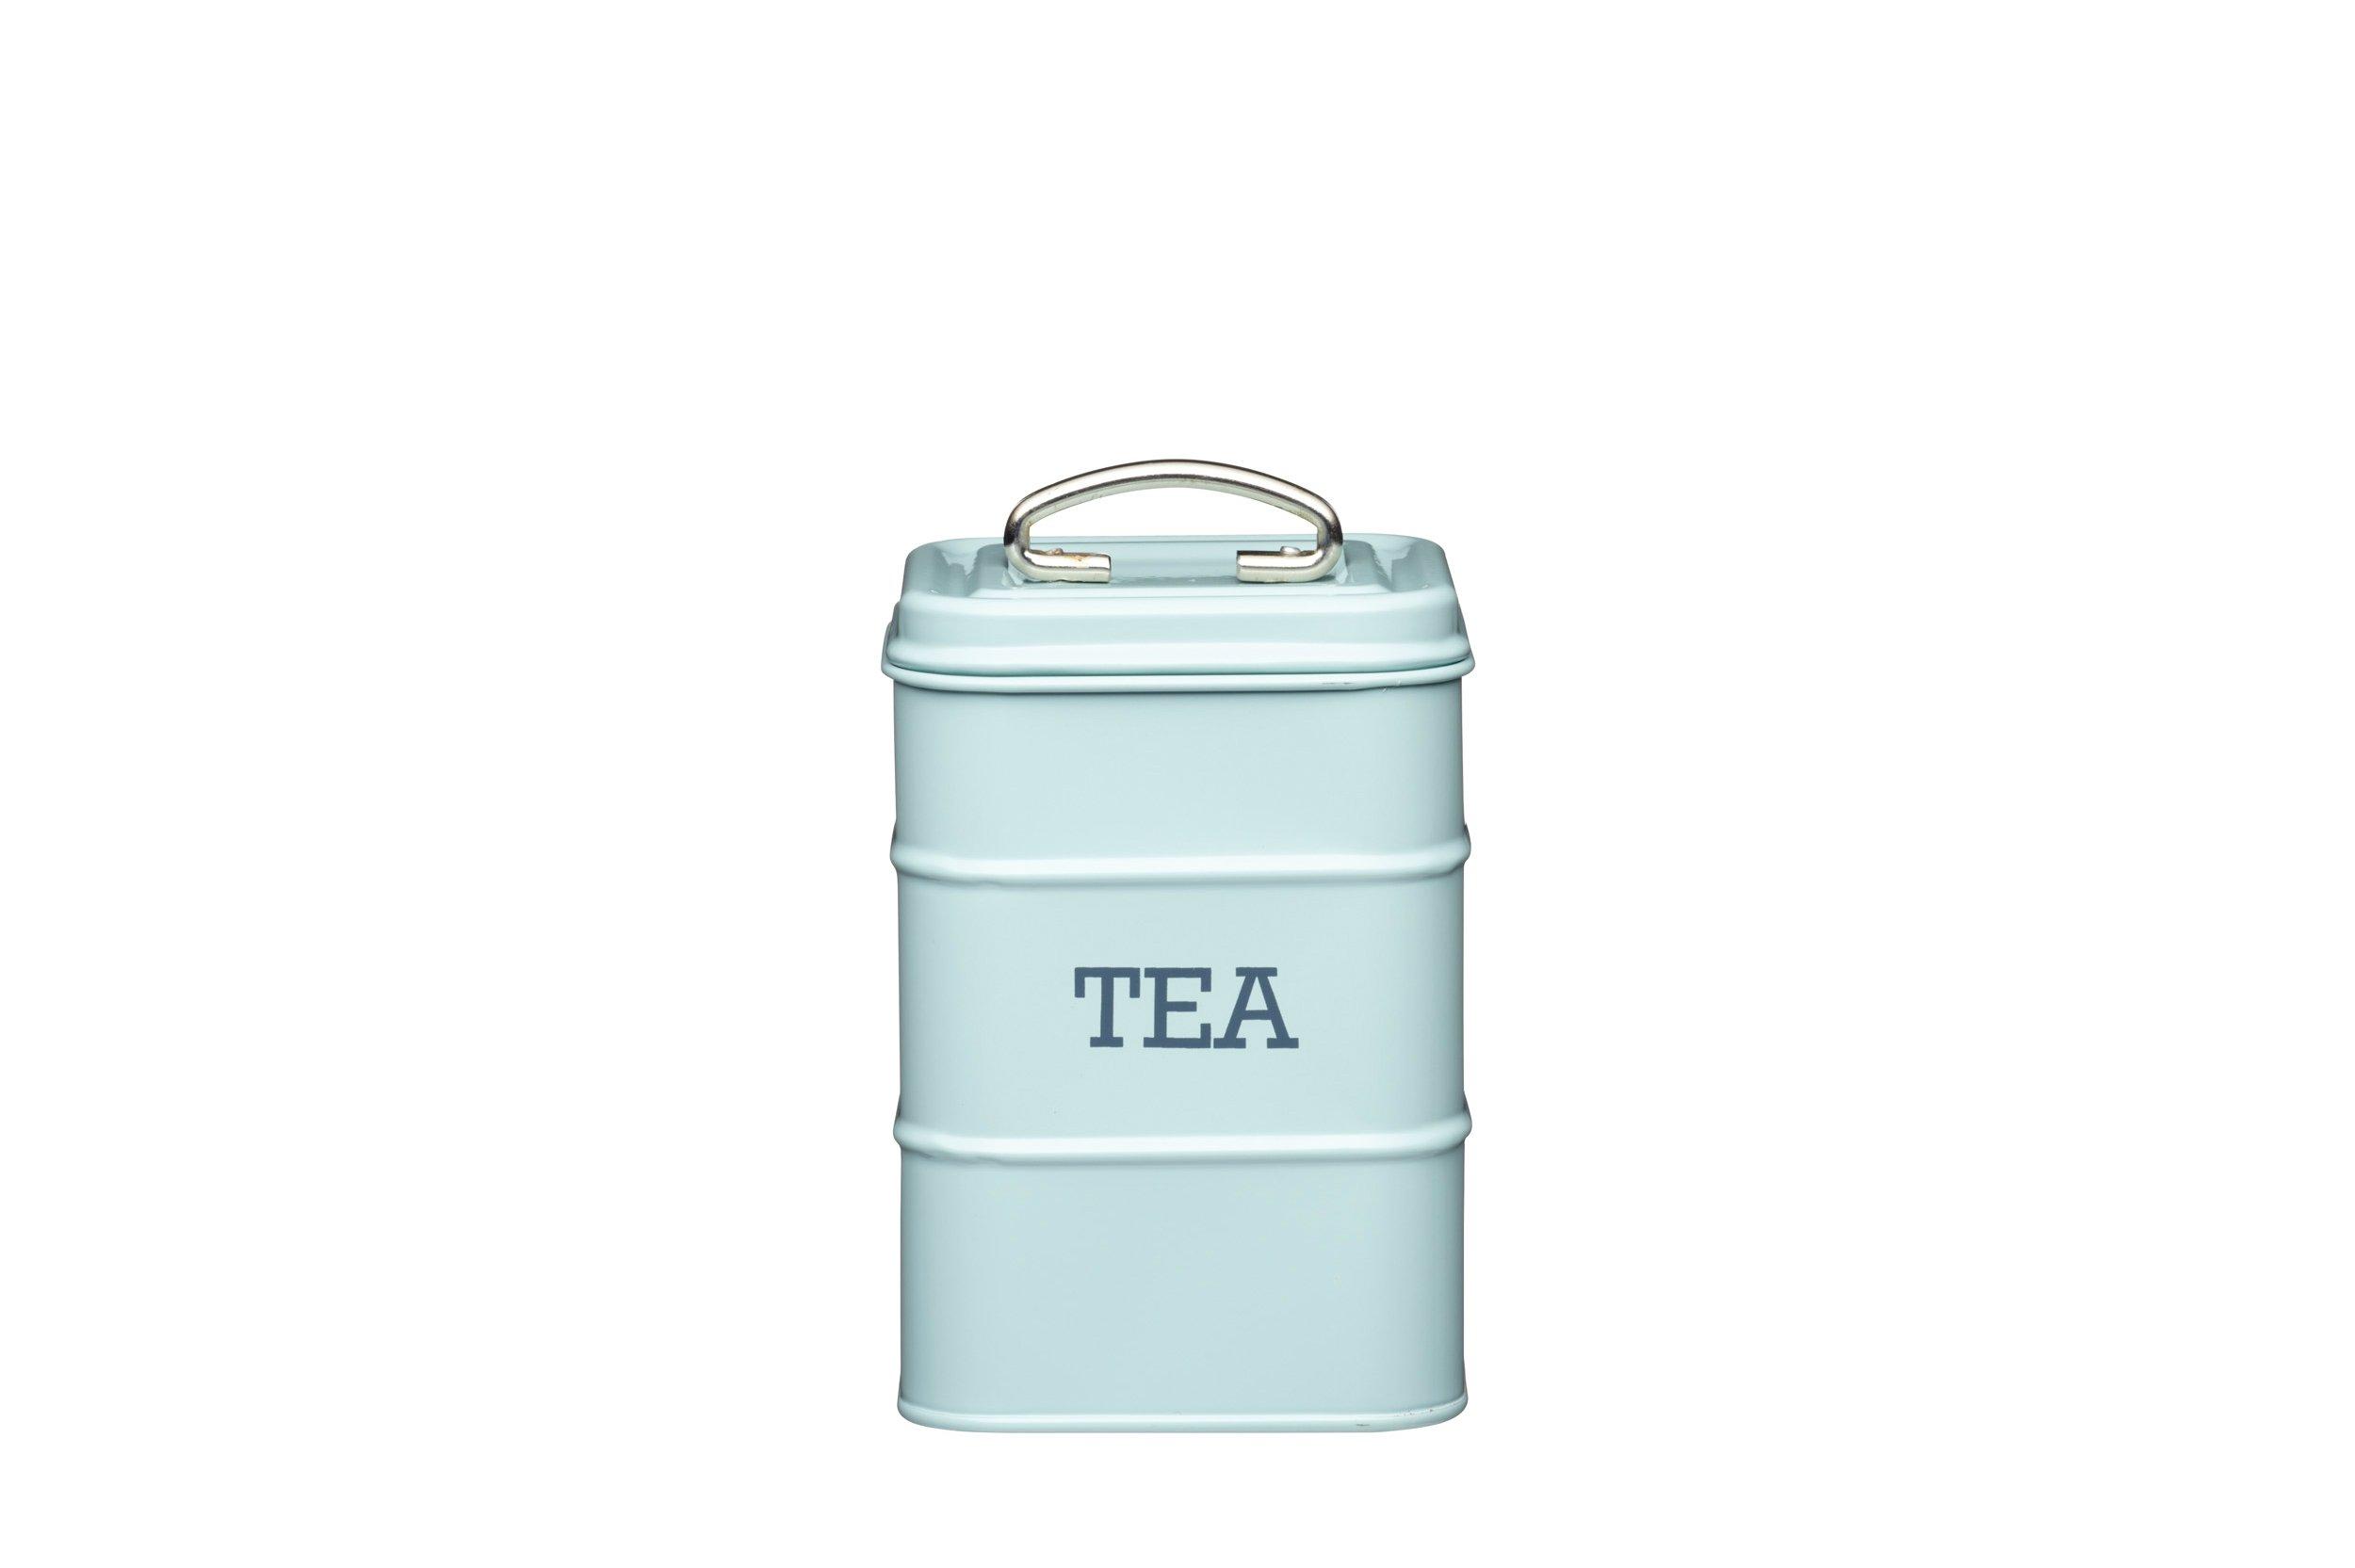 Living Nostalgia Tea Canister, 11x17cm, Blue, Tagged